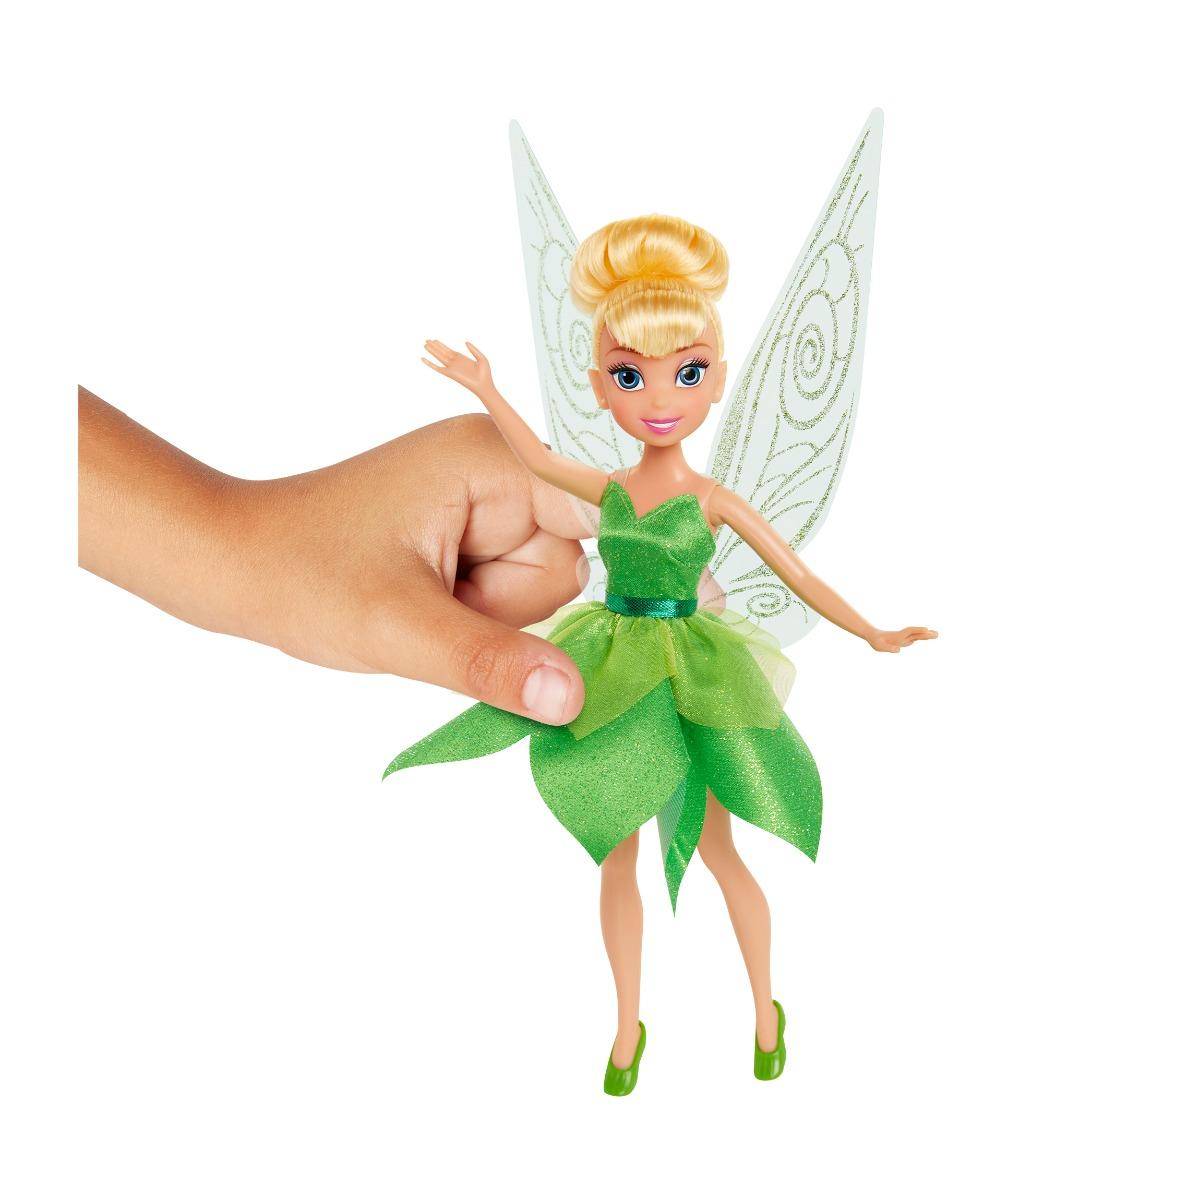 Papusa Disney Fairies, Tinker Bell, Verde, 23 cm